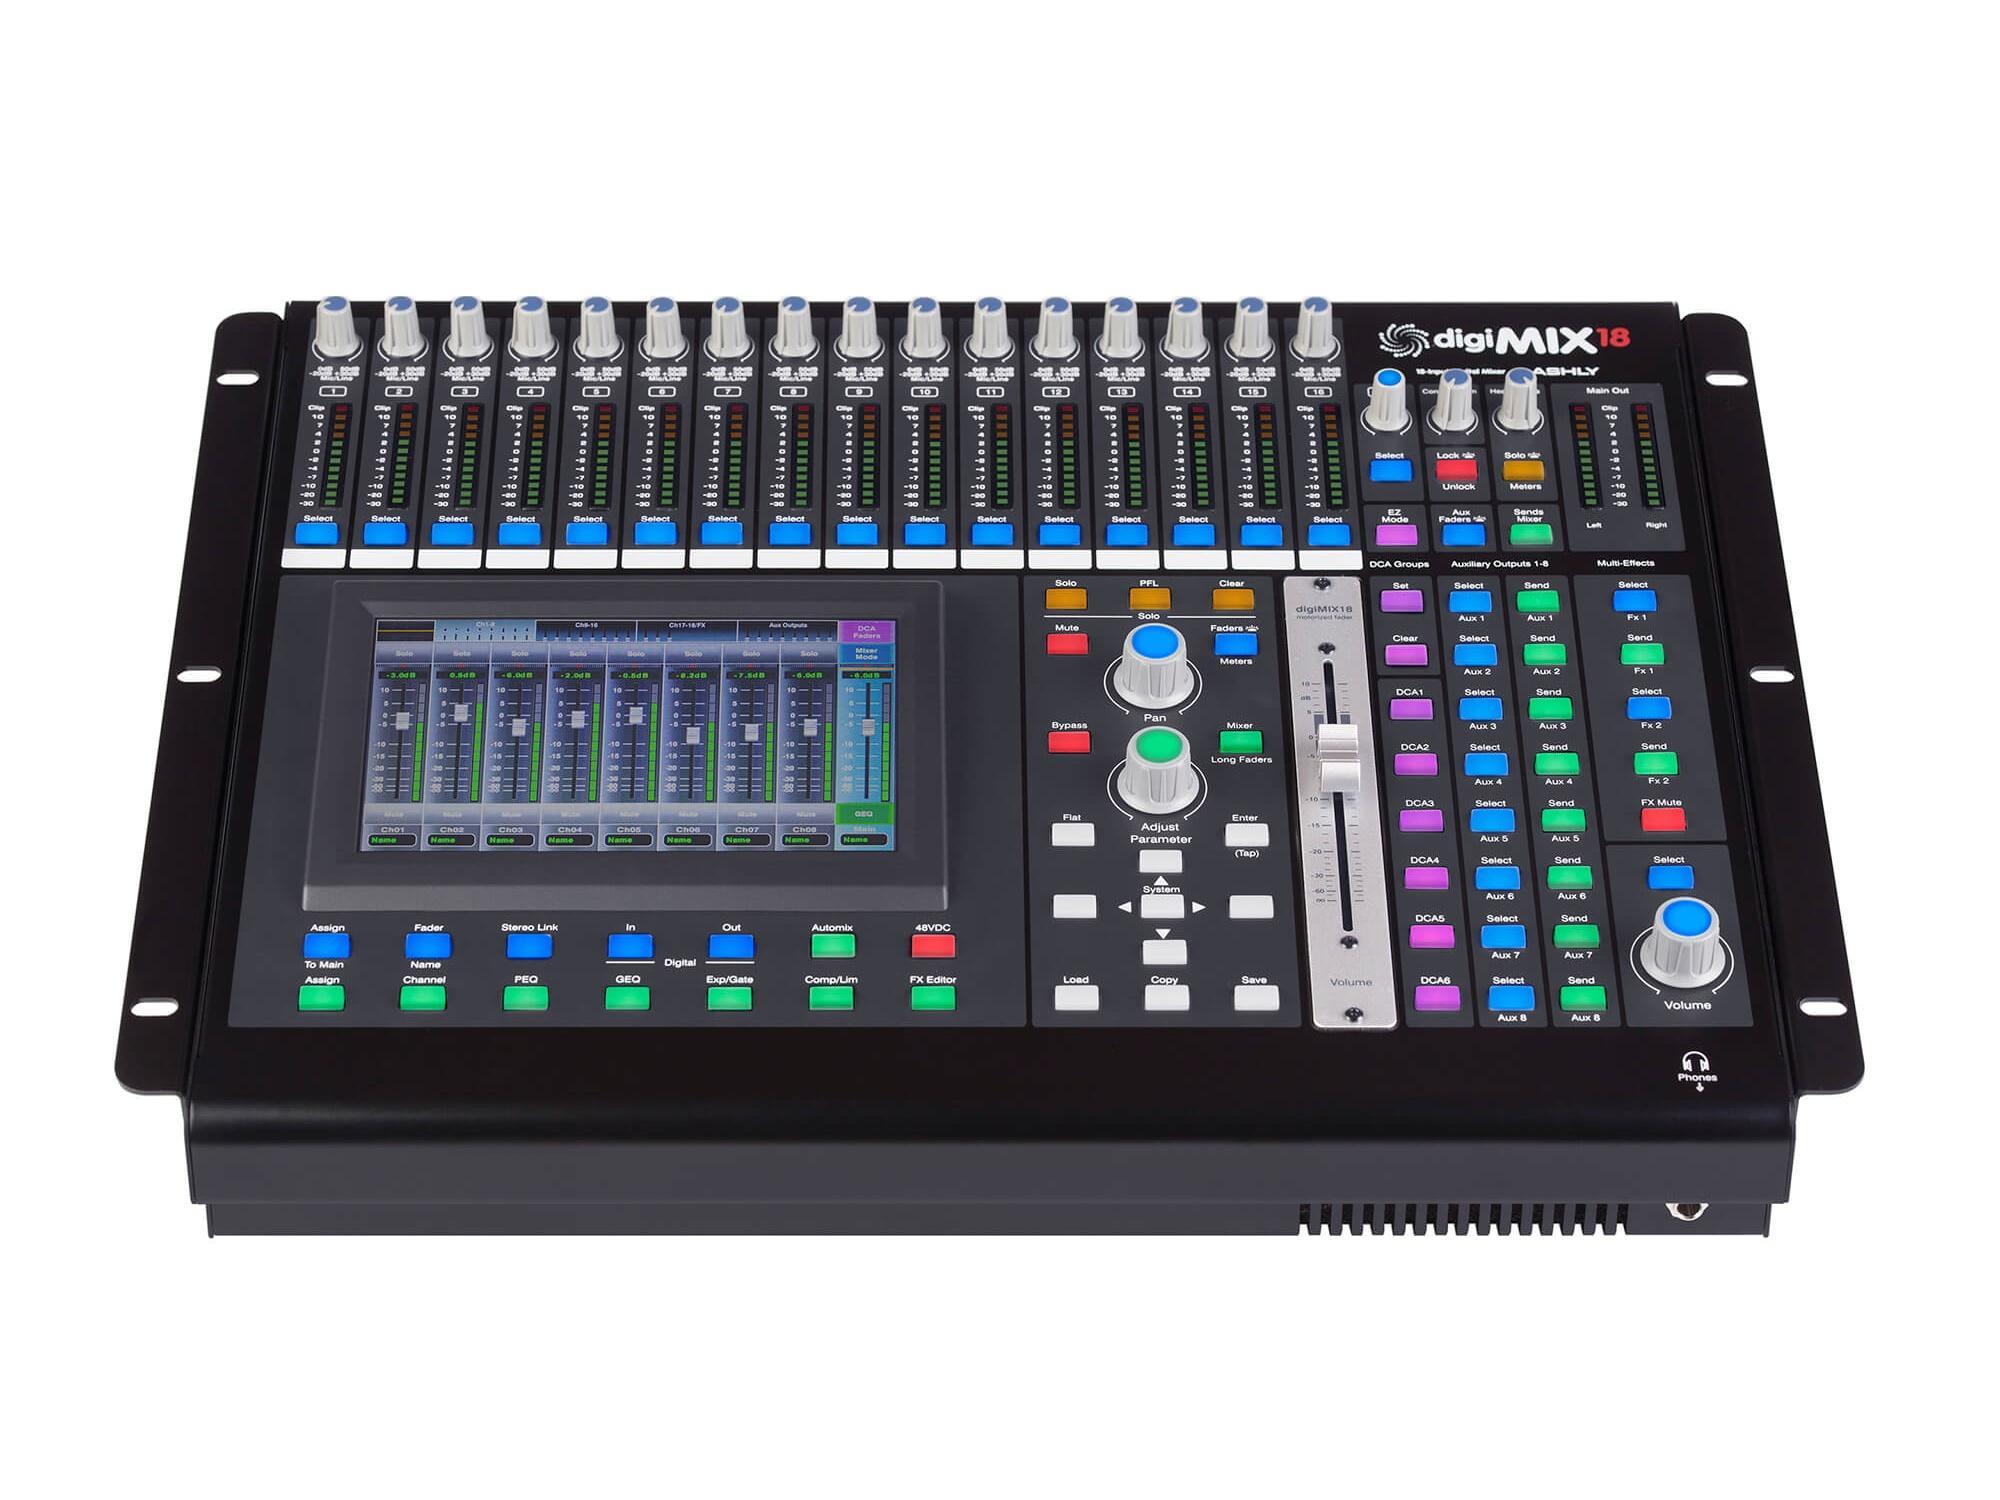 digimix18 ashly 18 channel digital mixer 2 x xlr outputs 2 x 1 4 inch outputs. Black Bedroom Furniture Sets. Home Design Ideas